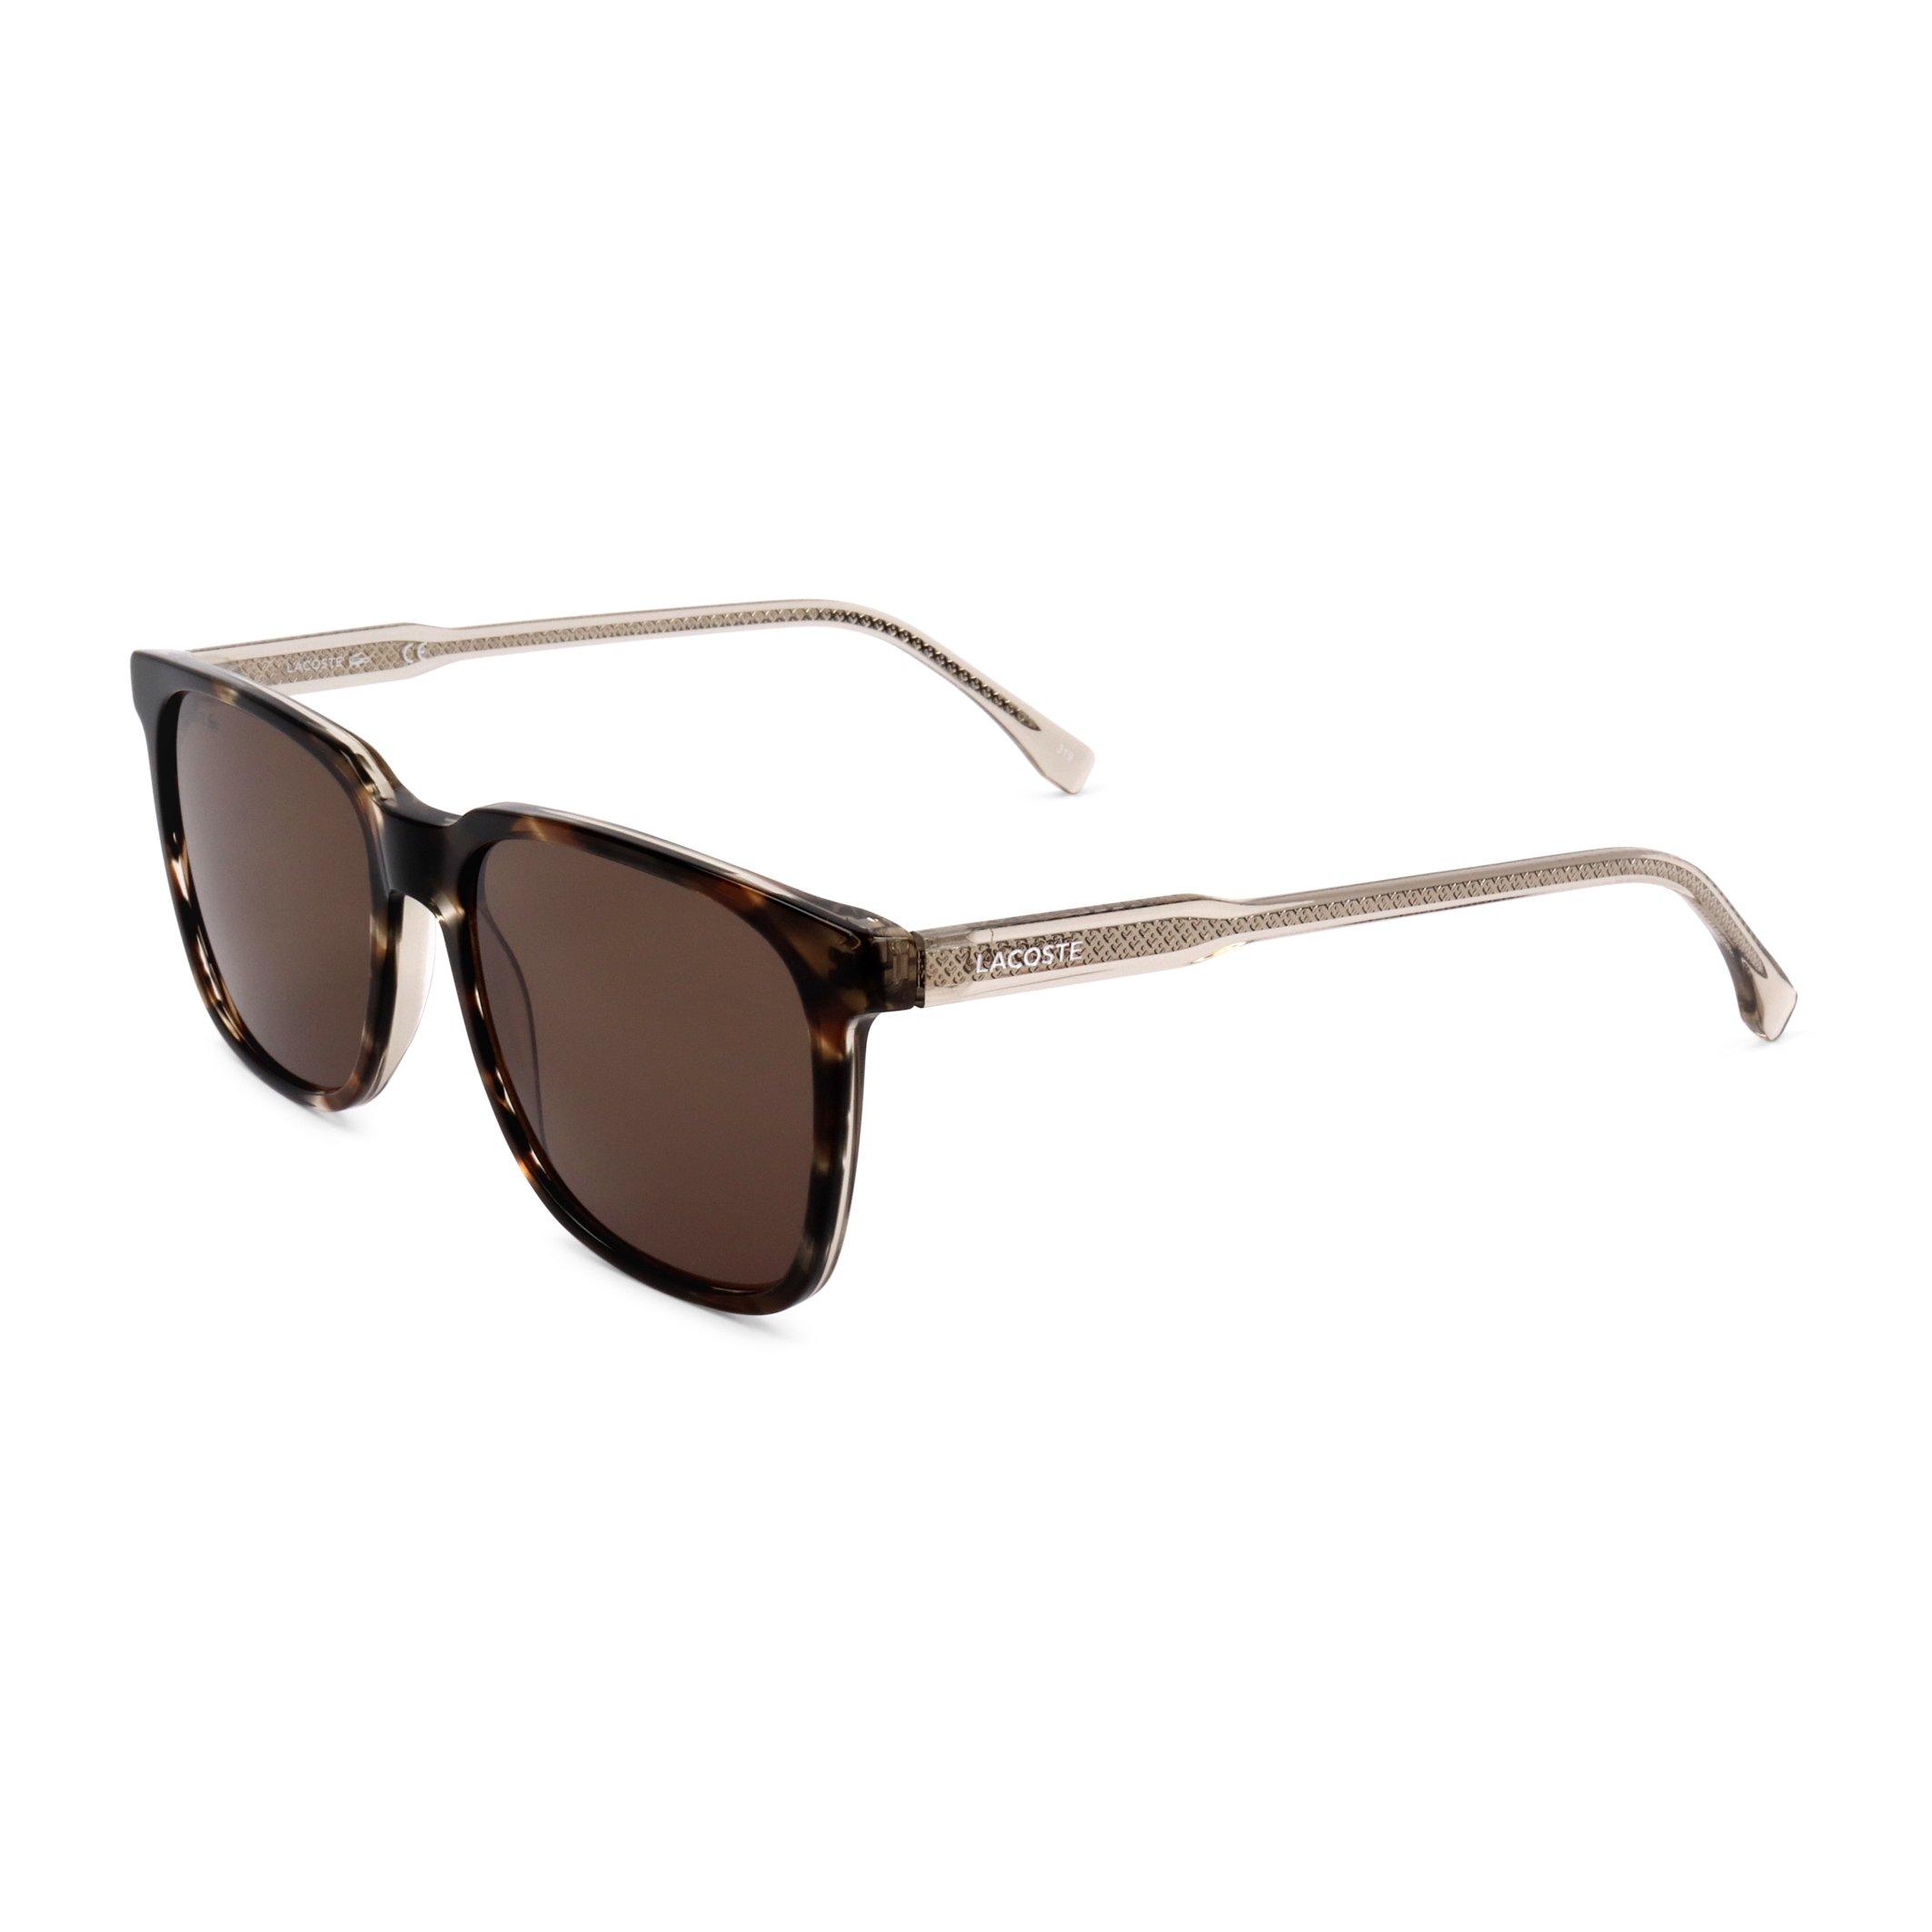 Lacoste Women's Sunglasses Brown L910S - brown-1 NOSIZE